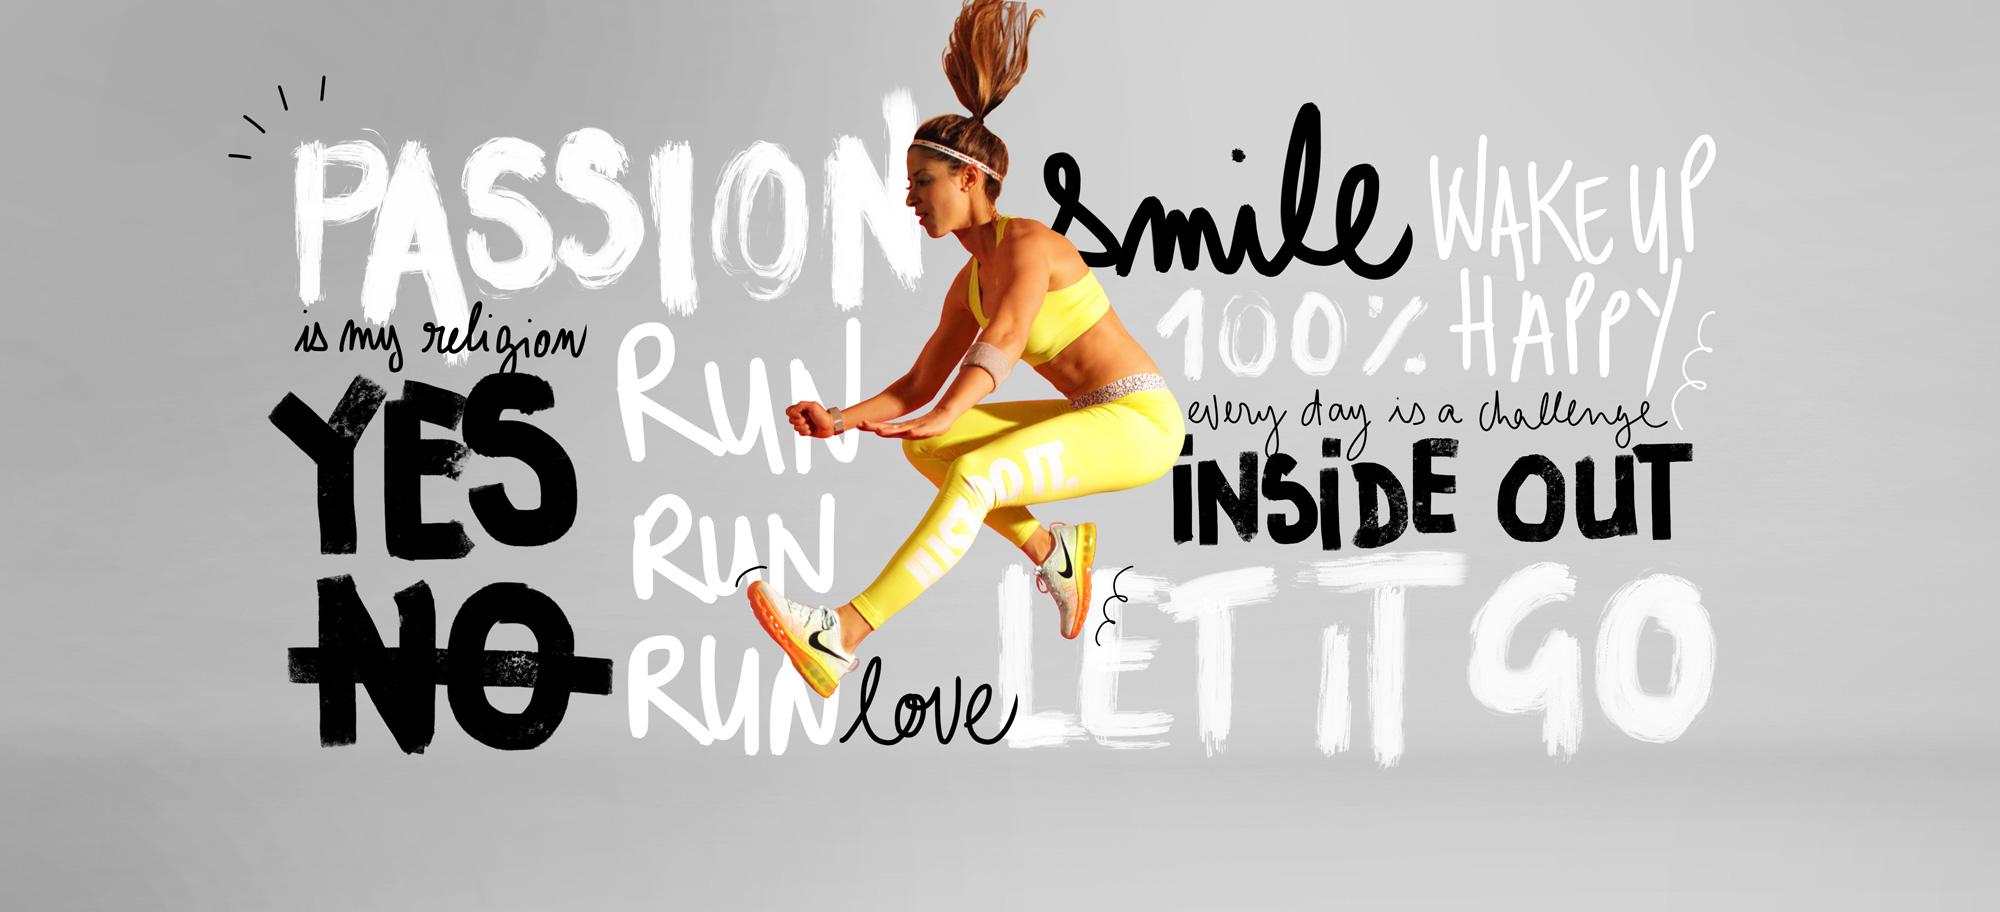 iconink-webdesign-cindy-coach-sport-athlete-nike-motivation-challenge